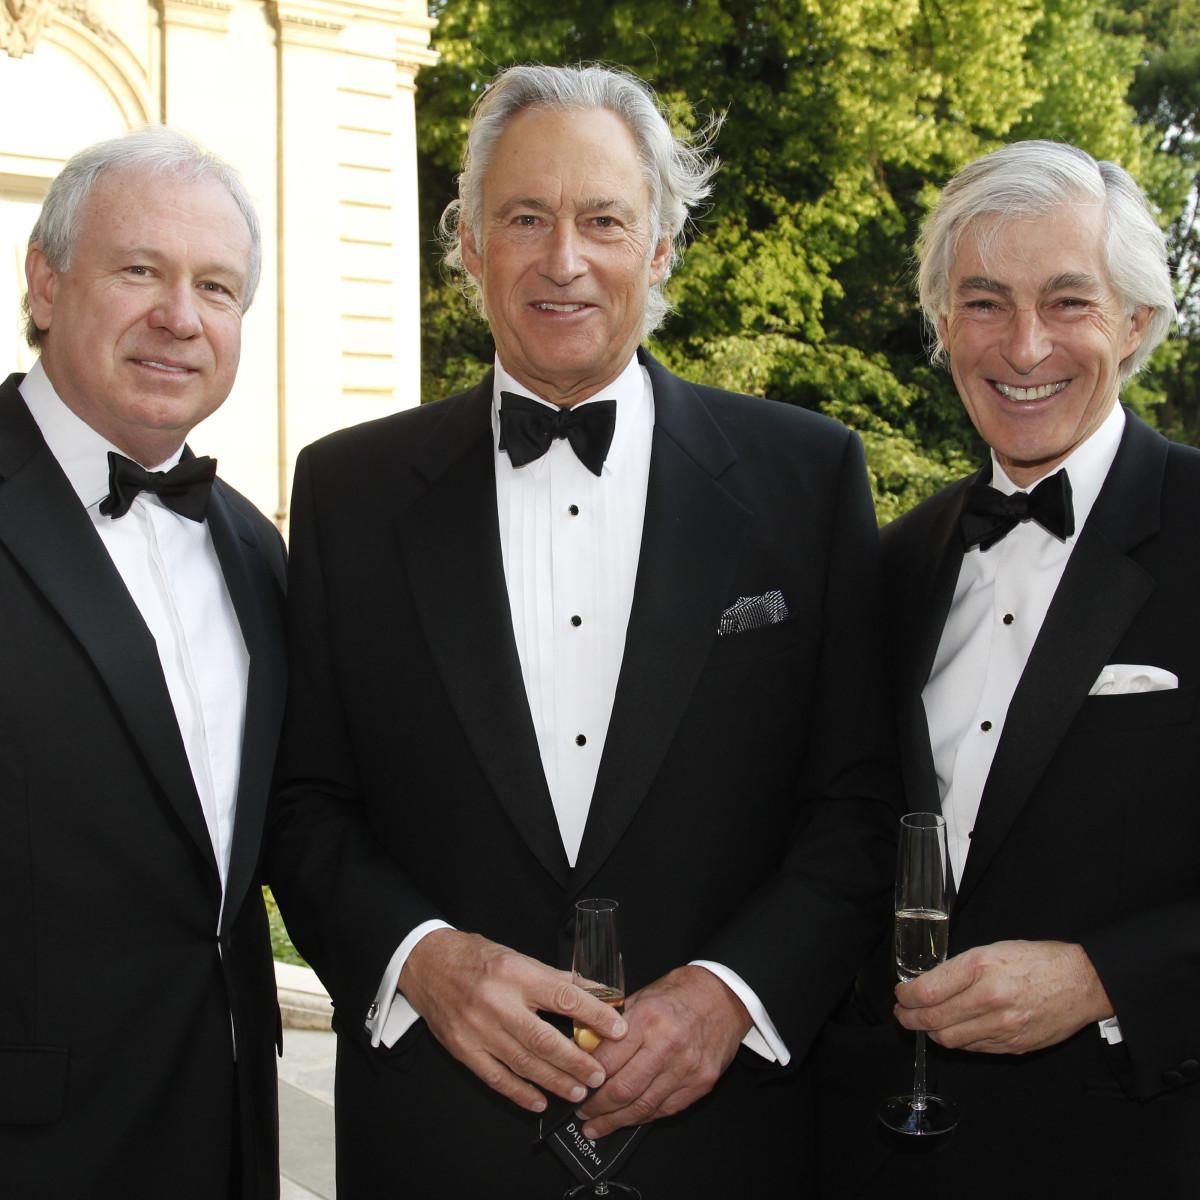 John Thrash and gents